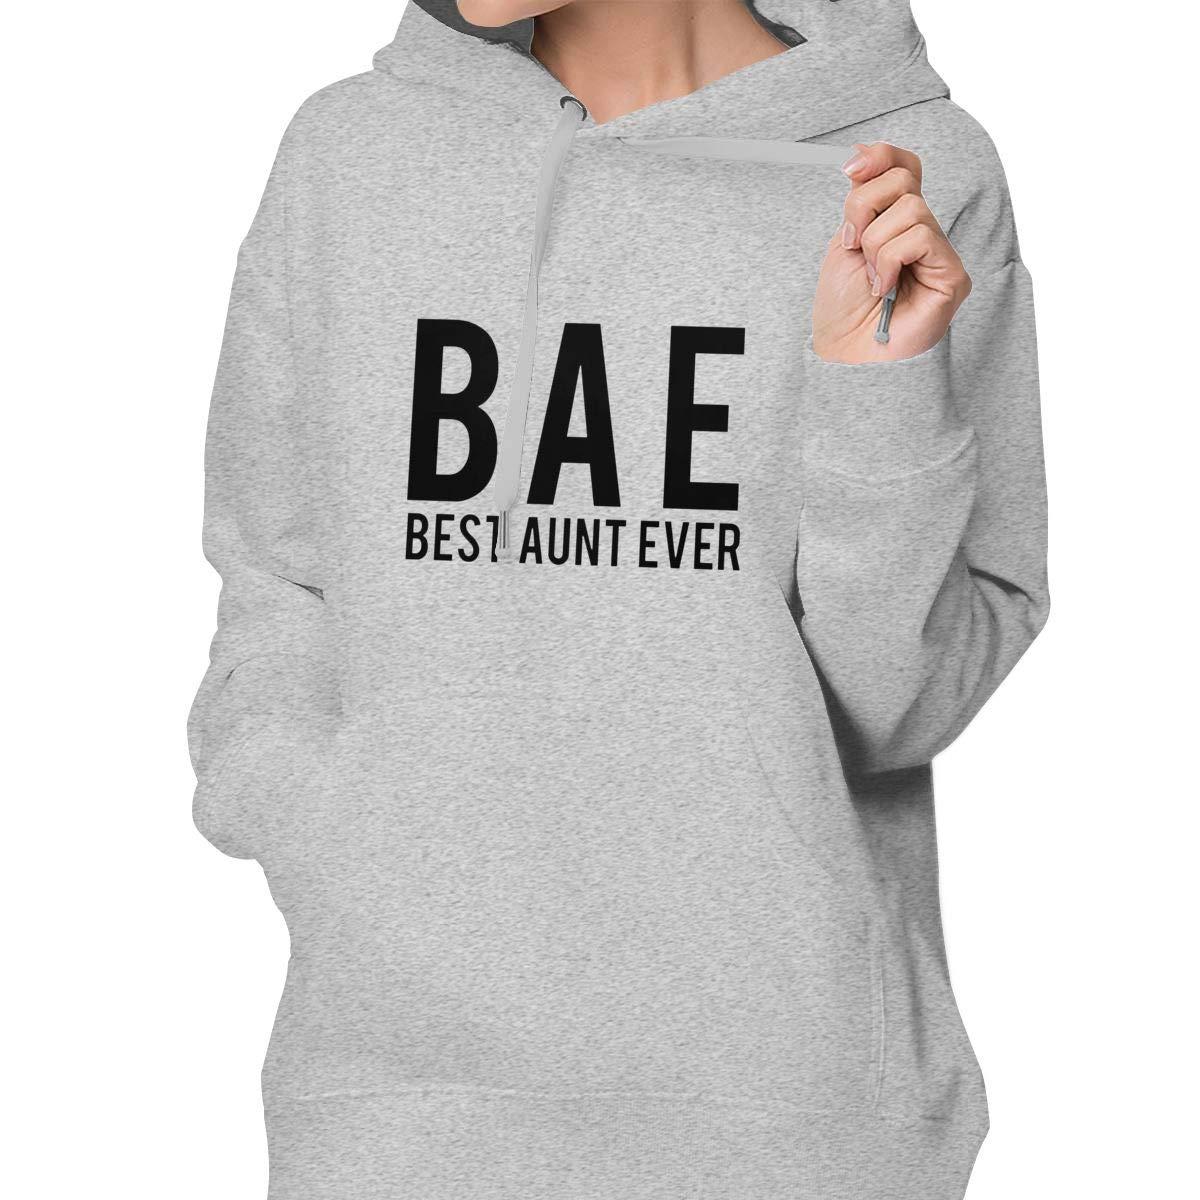 Lponvx Bae Best Aunt Ever Logo Womens Basic Long Sleeve Pullover Hoodie Sweatshirt with Drawstring Hood